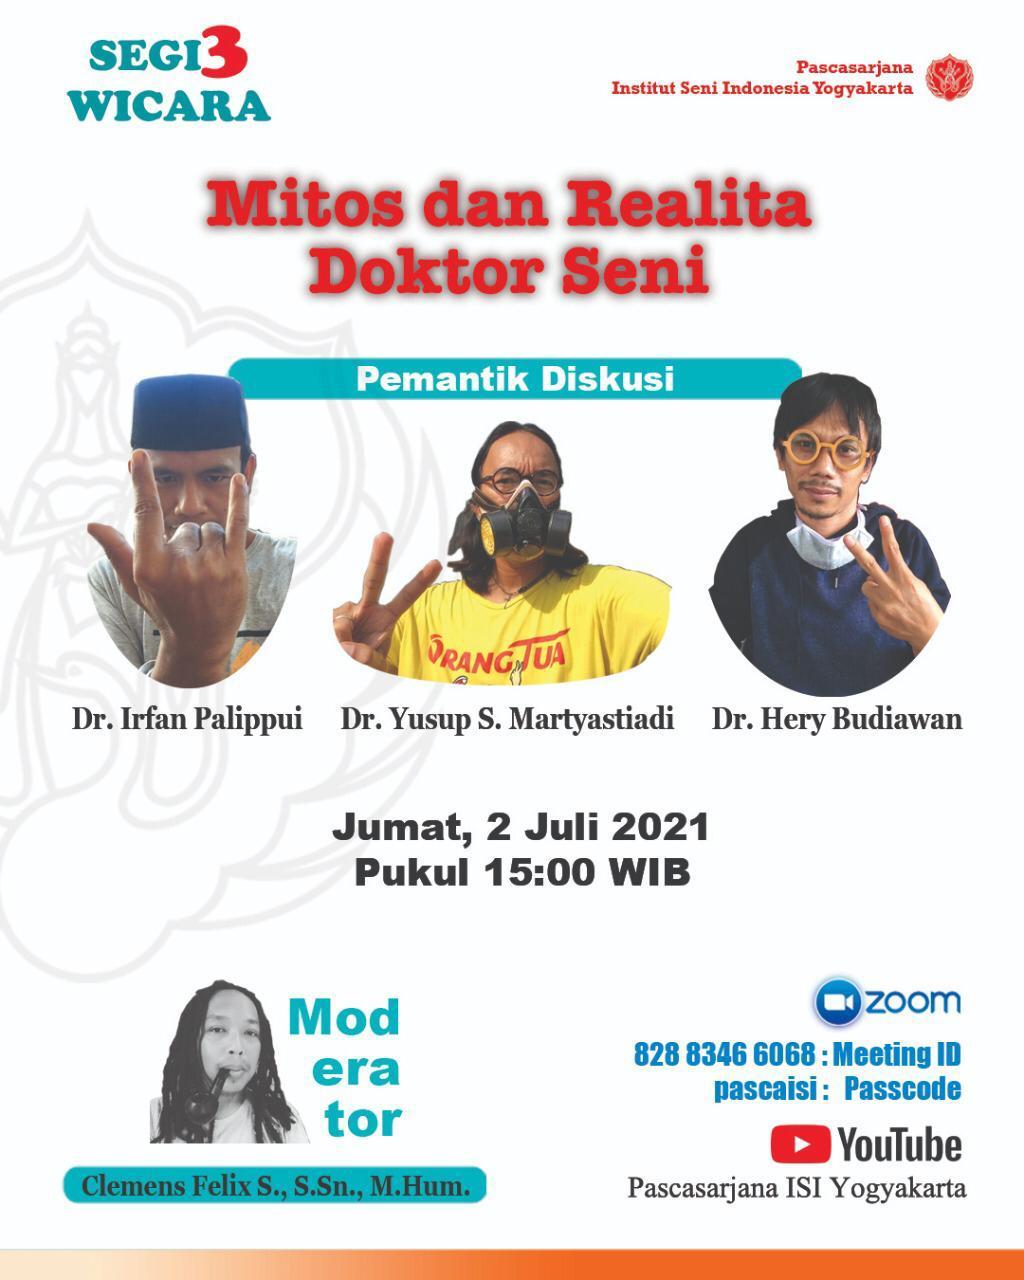 Pengalaman Sekolah Doktoral di ISI Yogyakarta? Bagaimana Pengalaman Mereka?